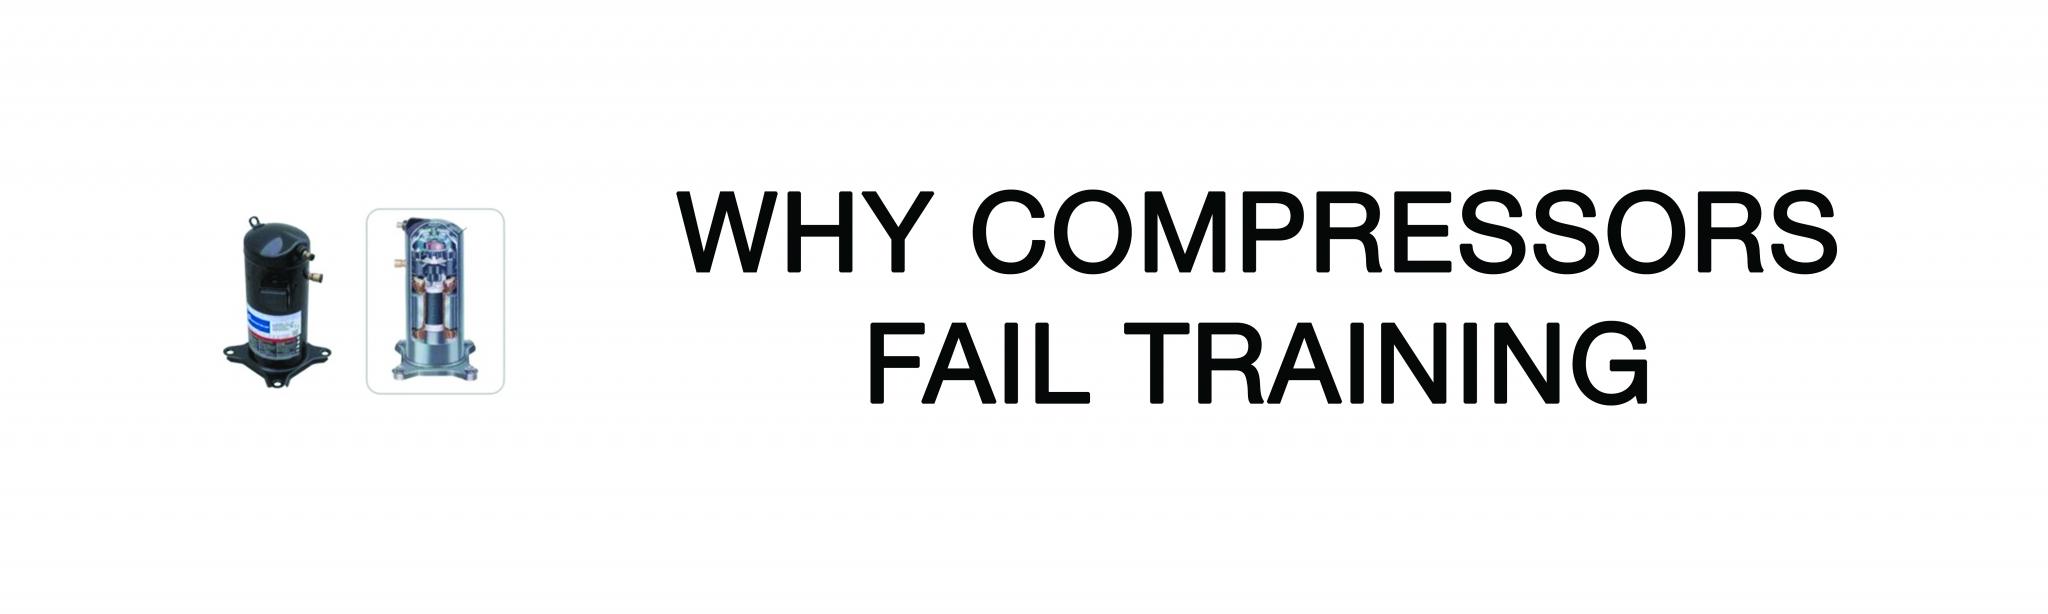 Why Compressors Fail Training - Kansas City